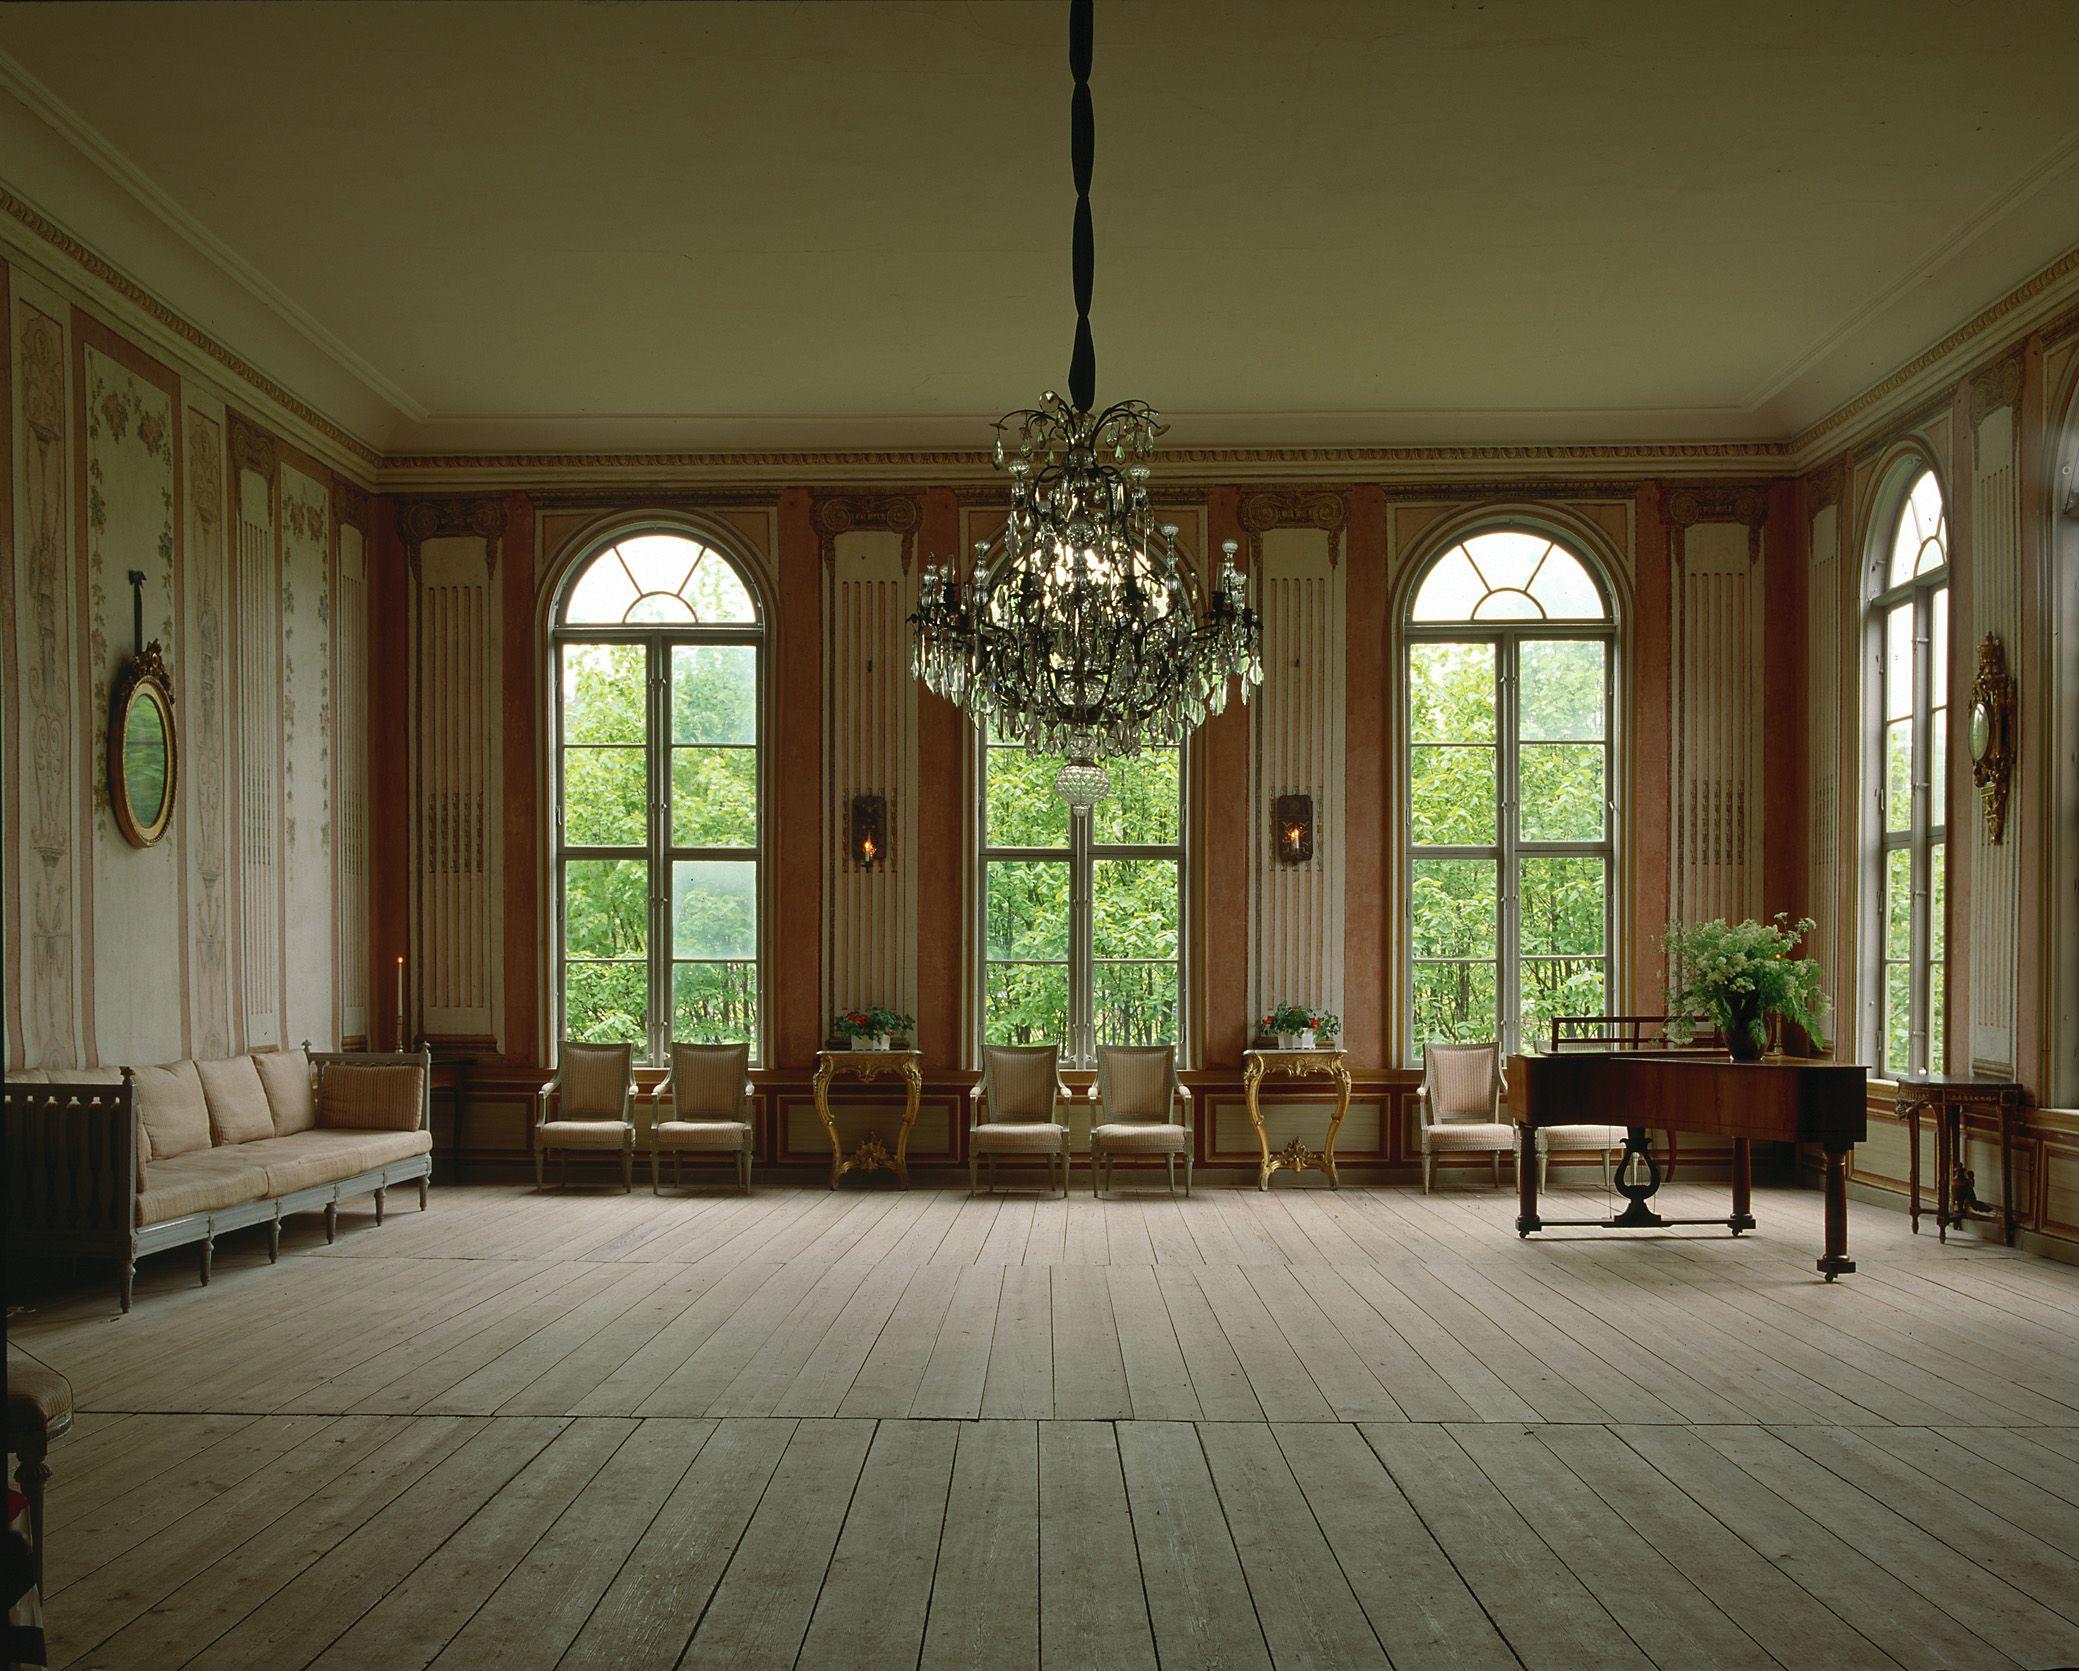 Swedish Gustavian Furniture 18th Century Swedish Decorating. Swedish Gustavian Furniture 18th Century Swedish Decorating